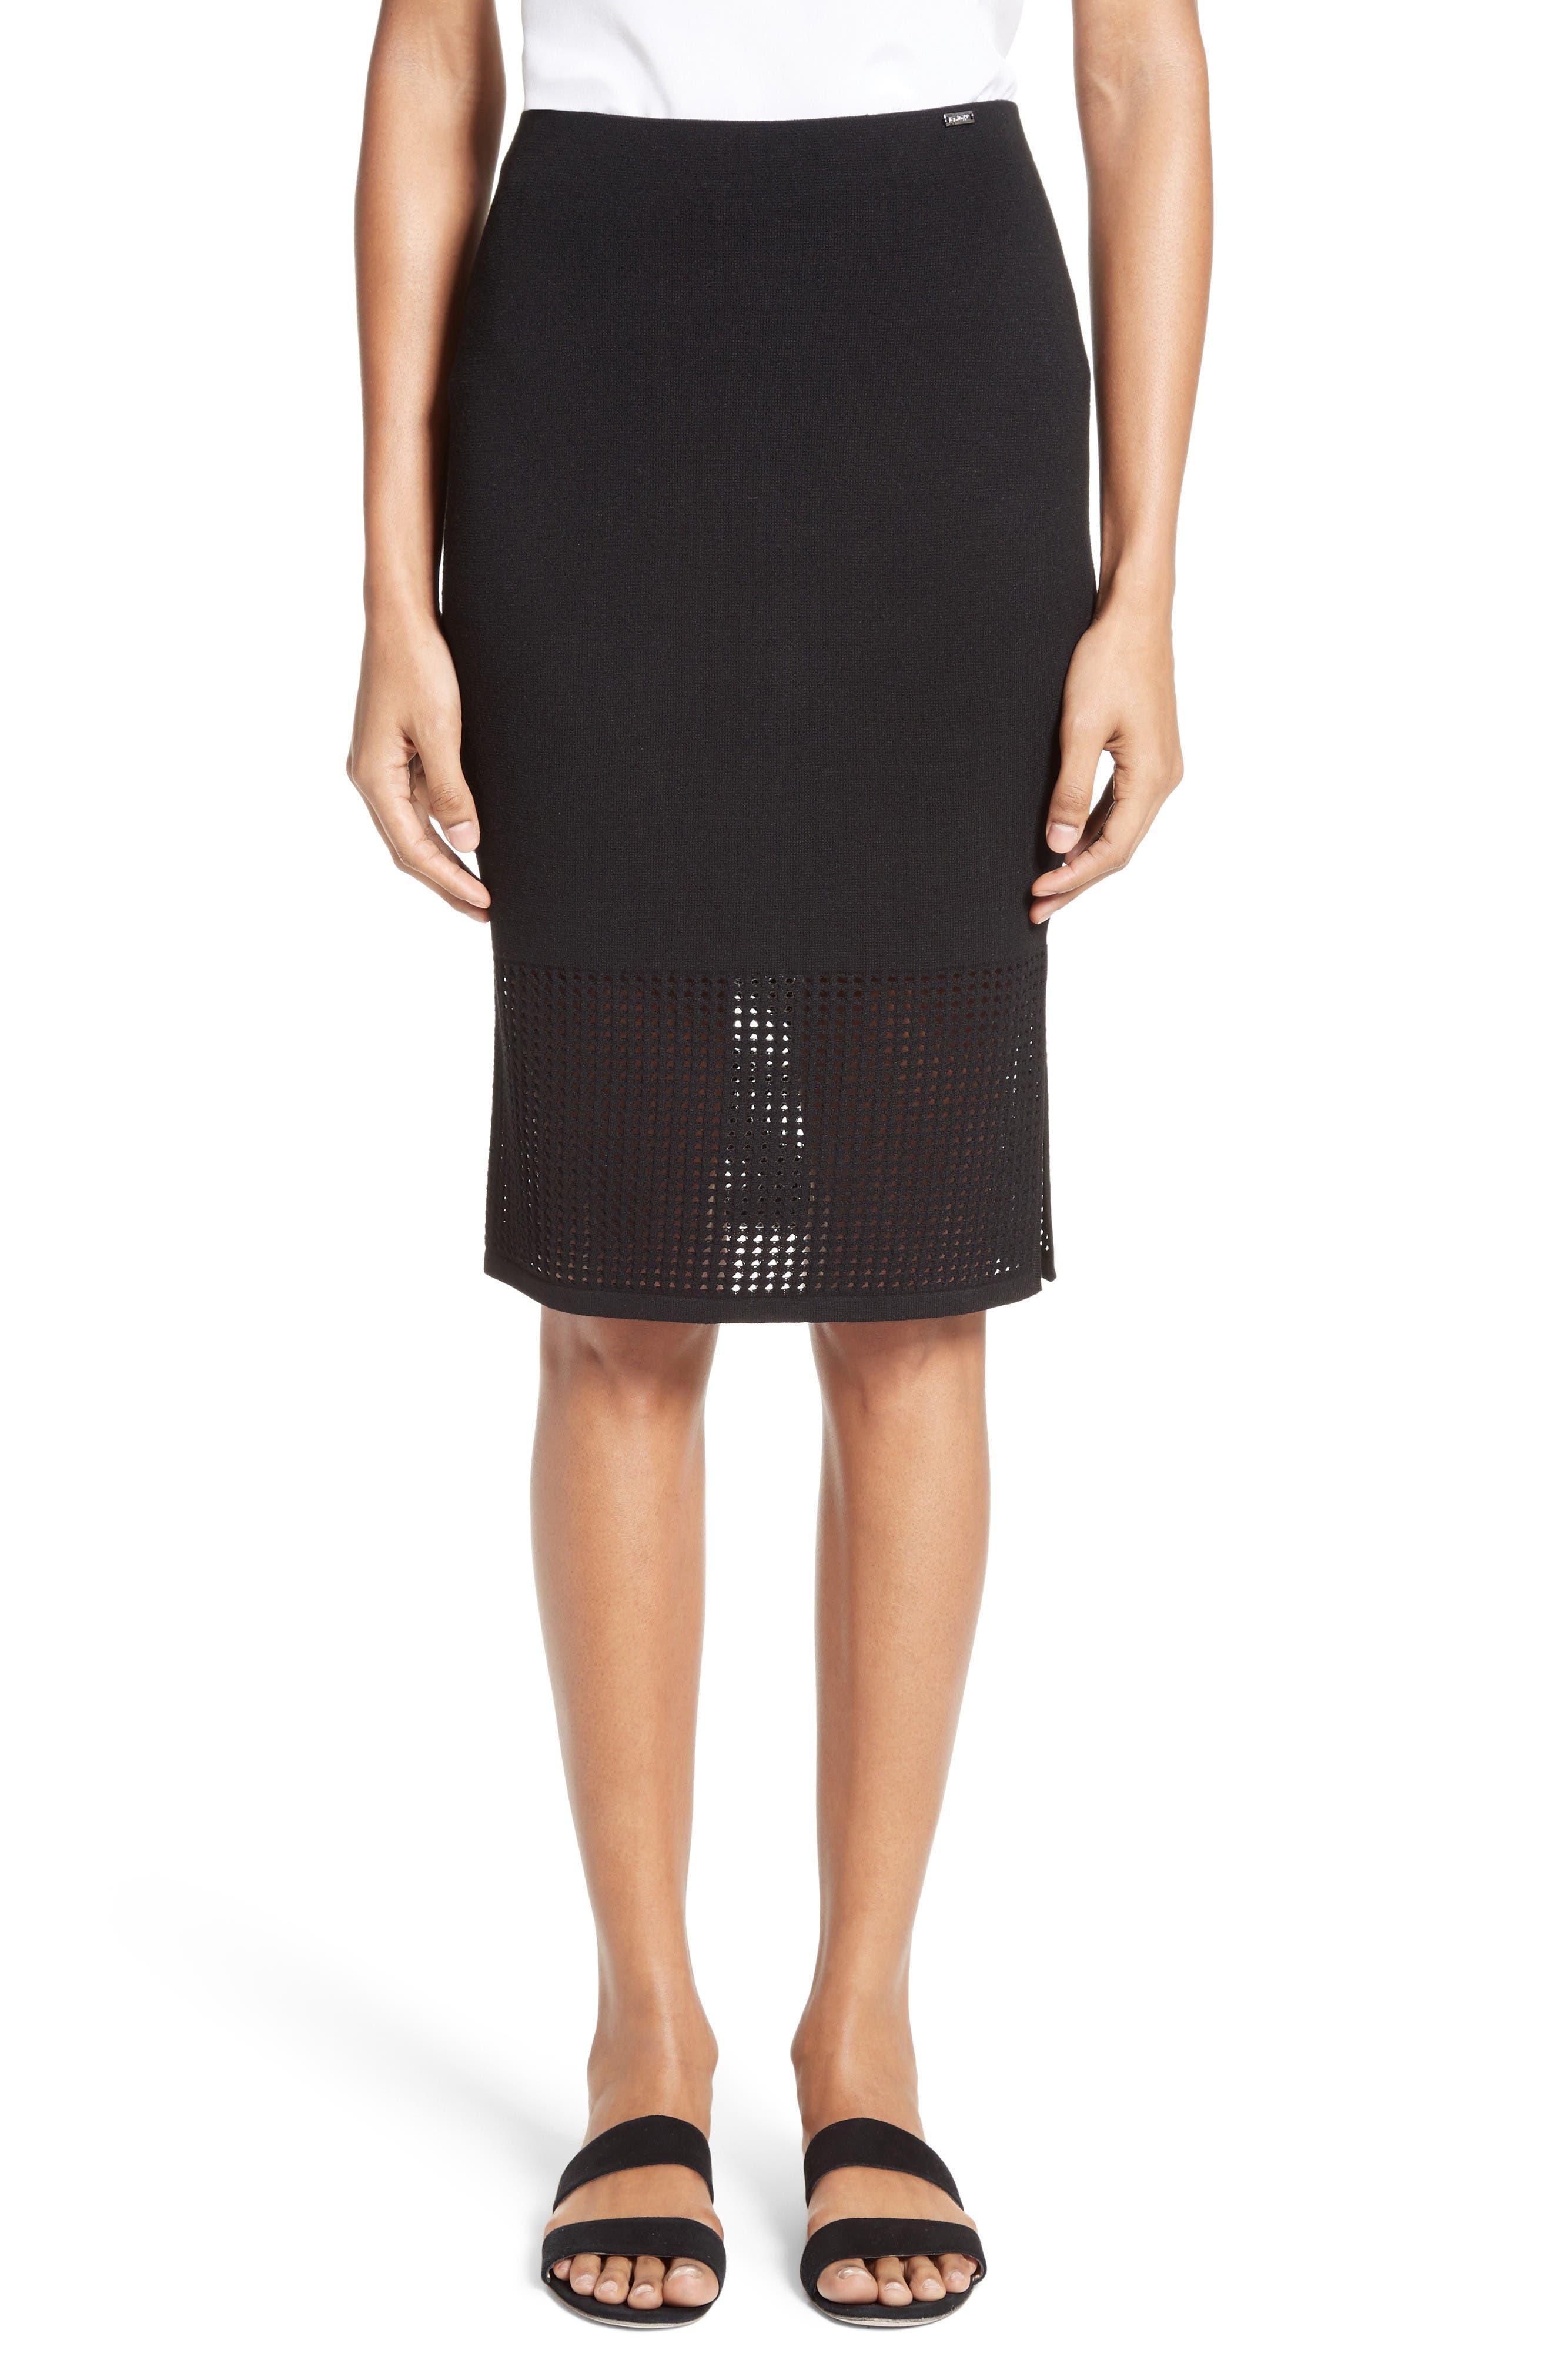 St. John Collection Technical Mesh Knit Pencil Skirt